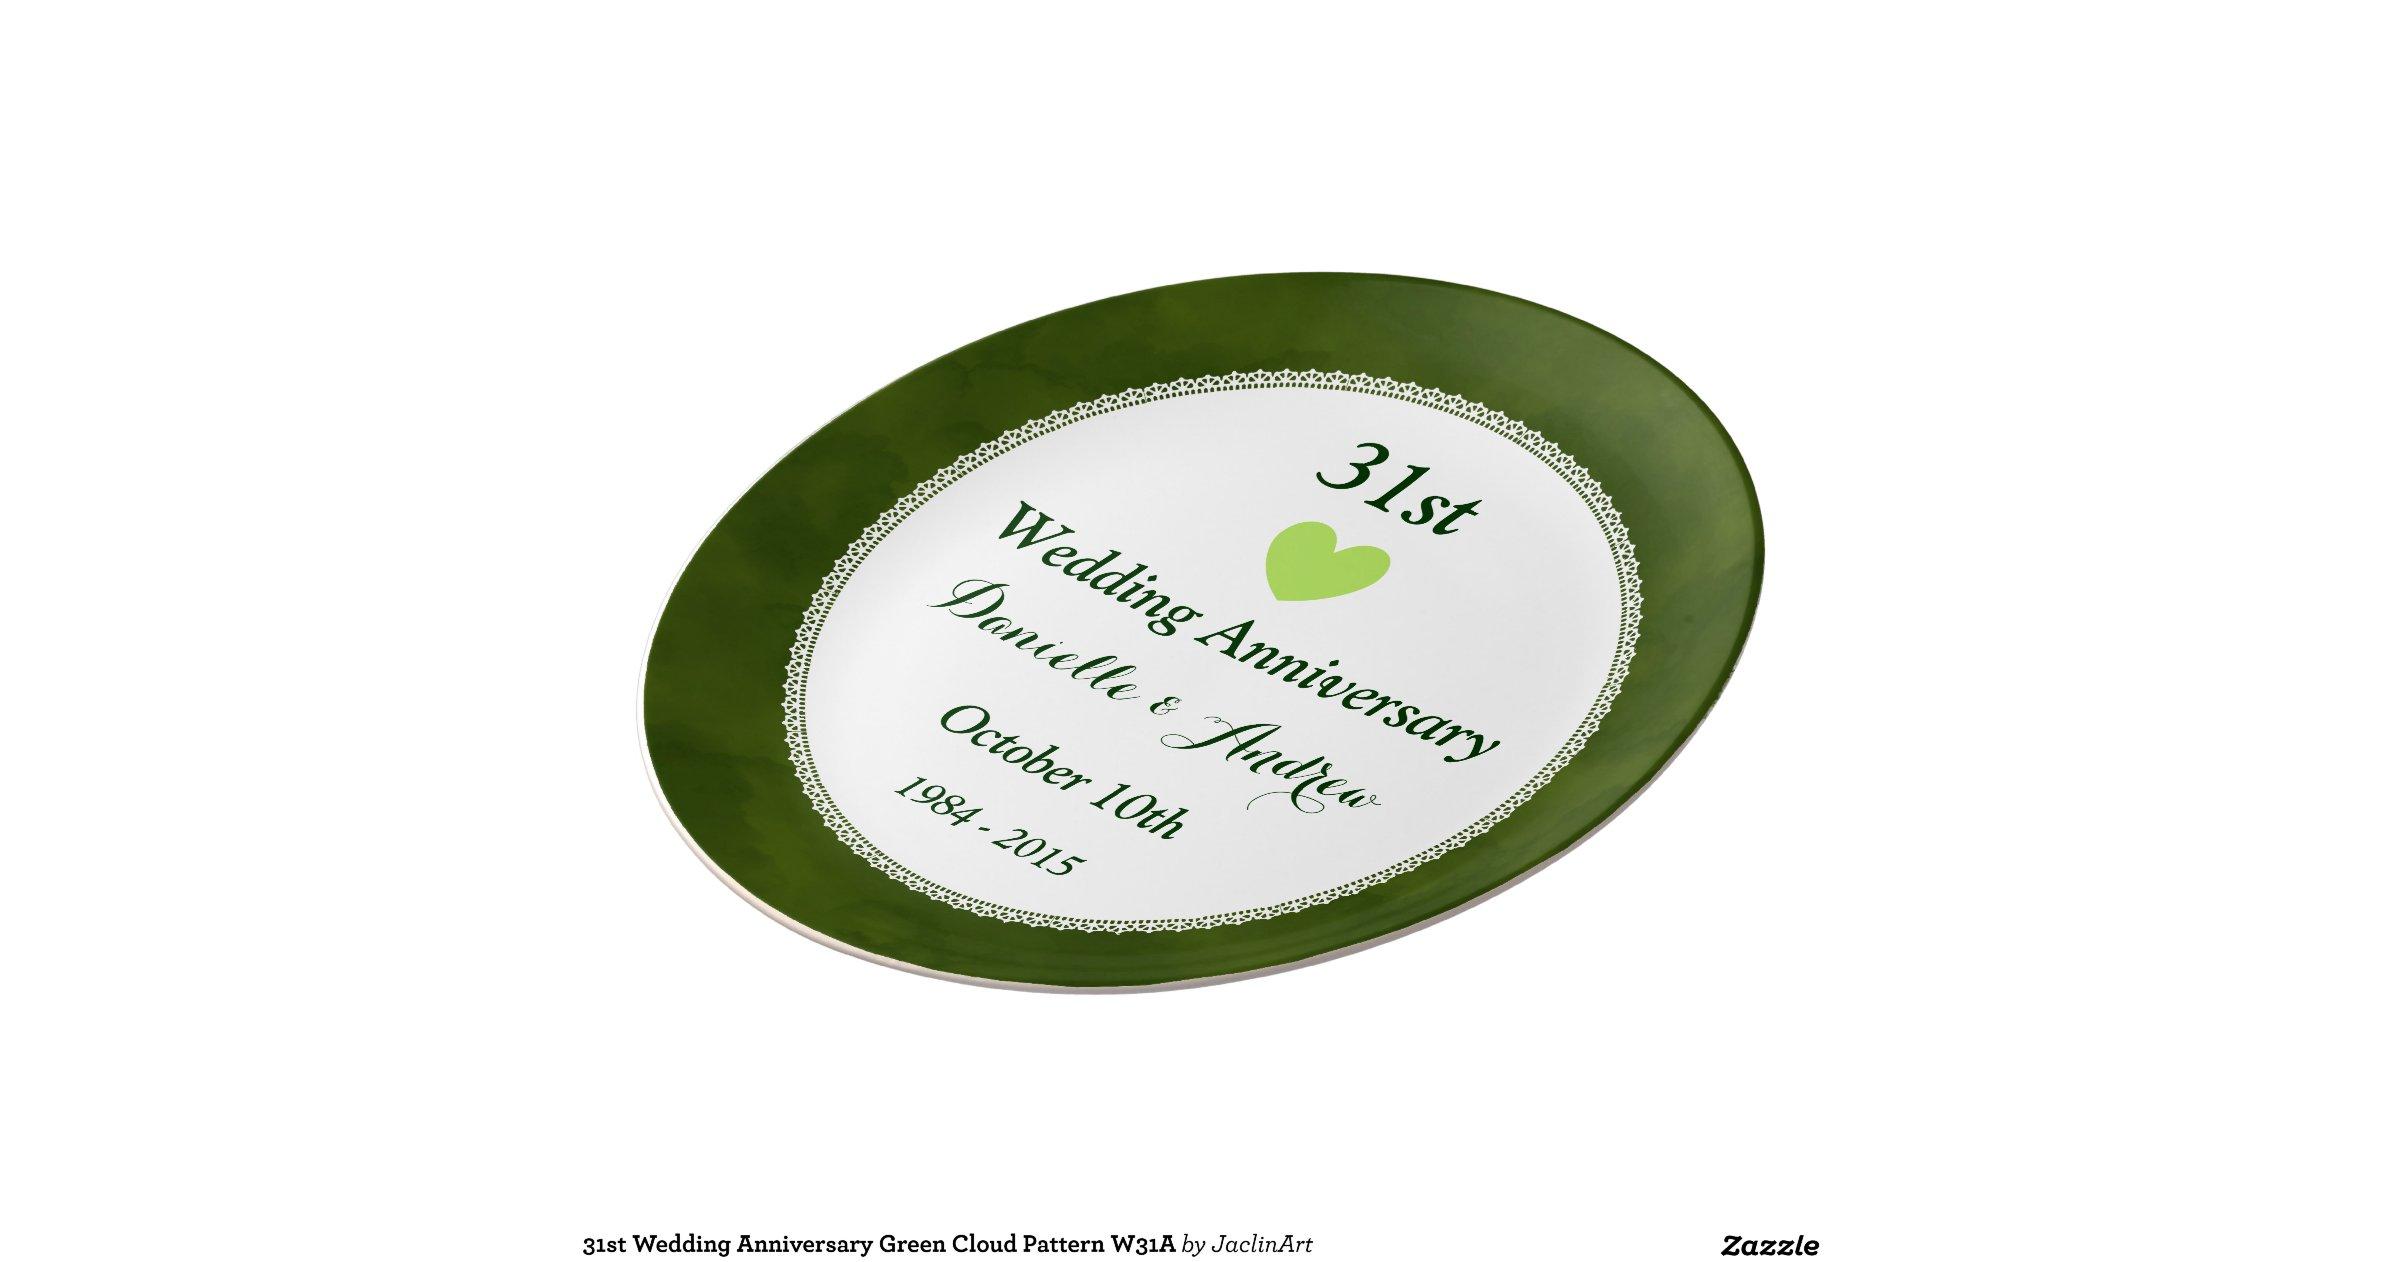 31st Wedding Anniversary Gifts: 31st Wedding Anniversary Green Cloud Pattern W31A